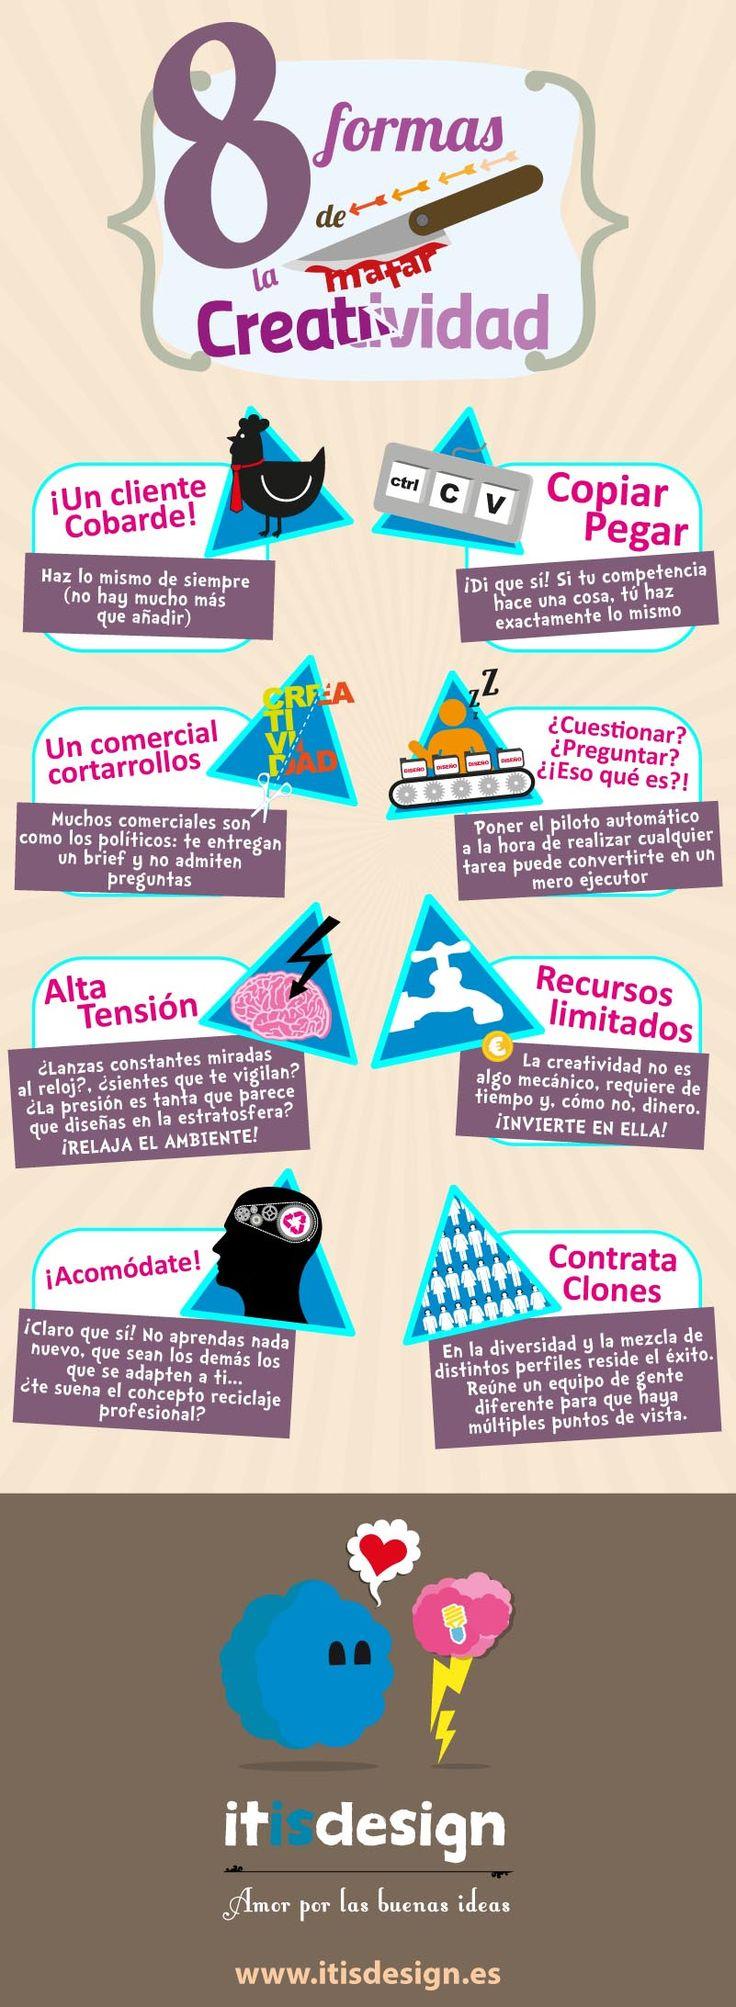 8 formas de matar la creatividad #infografia #infographic